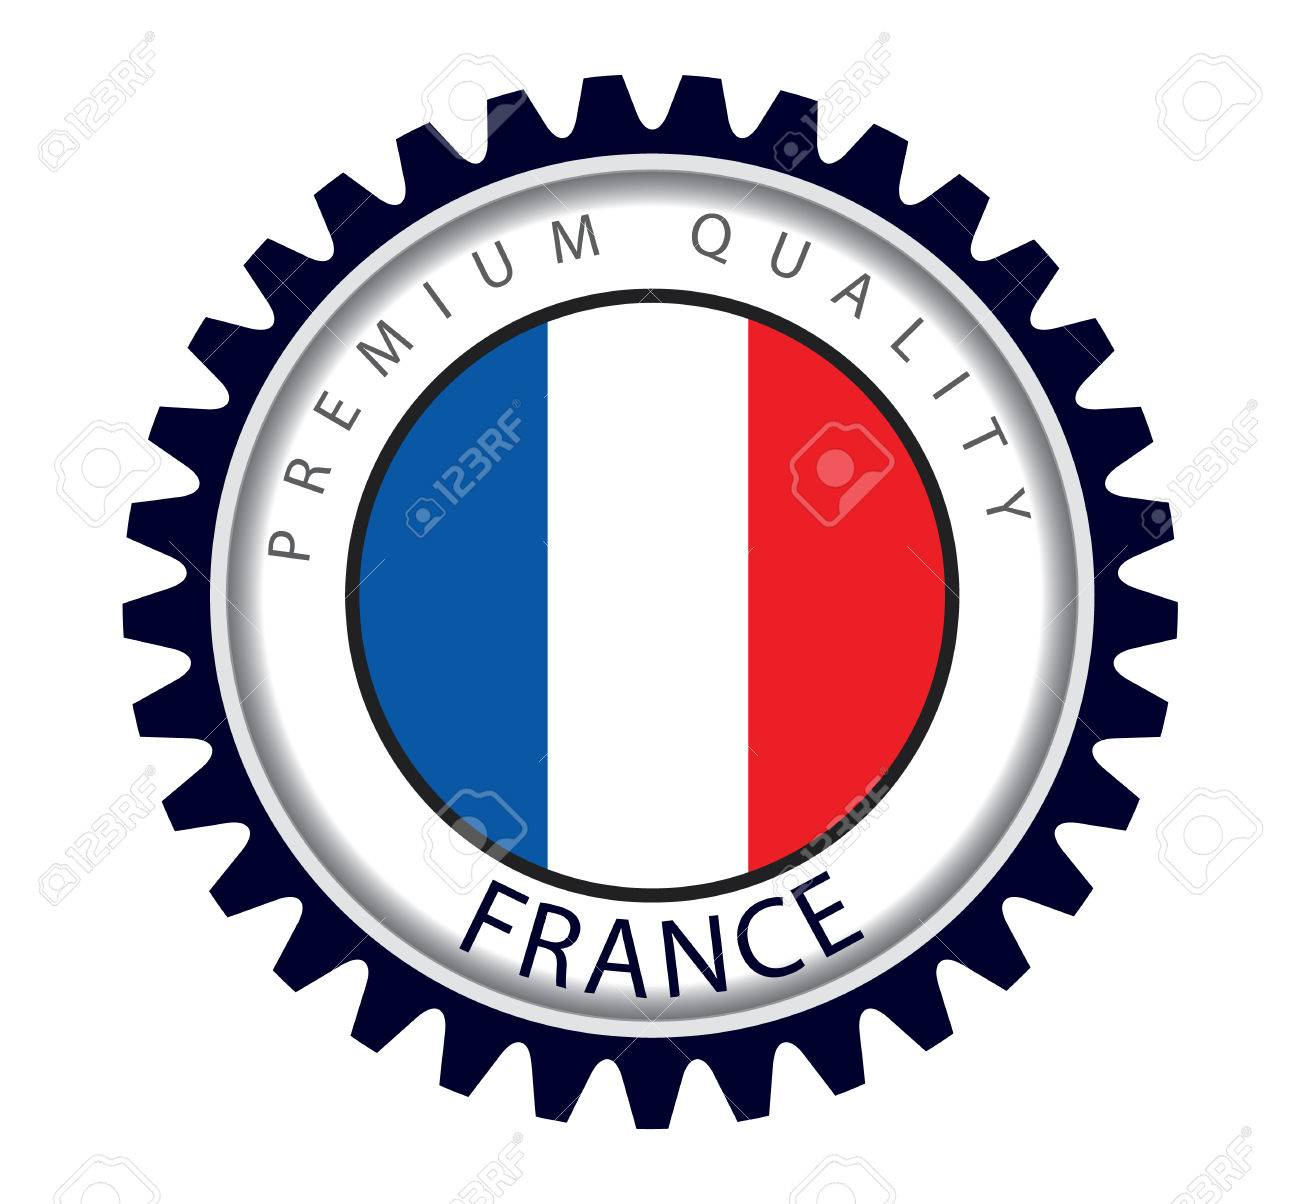 france seal french flag vector art royalty free cliparts vectors rh 123rf com sell vector art sell vectors